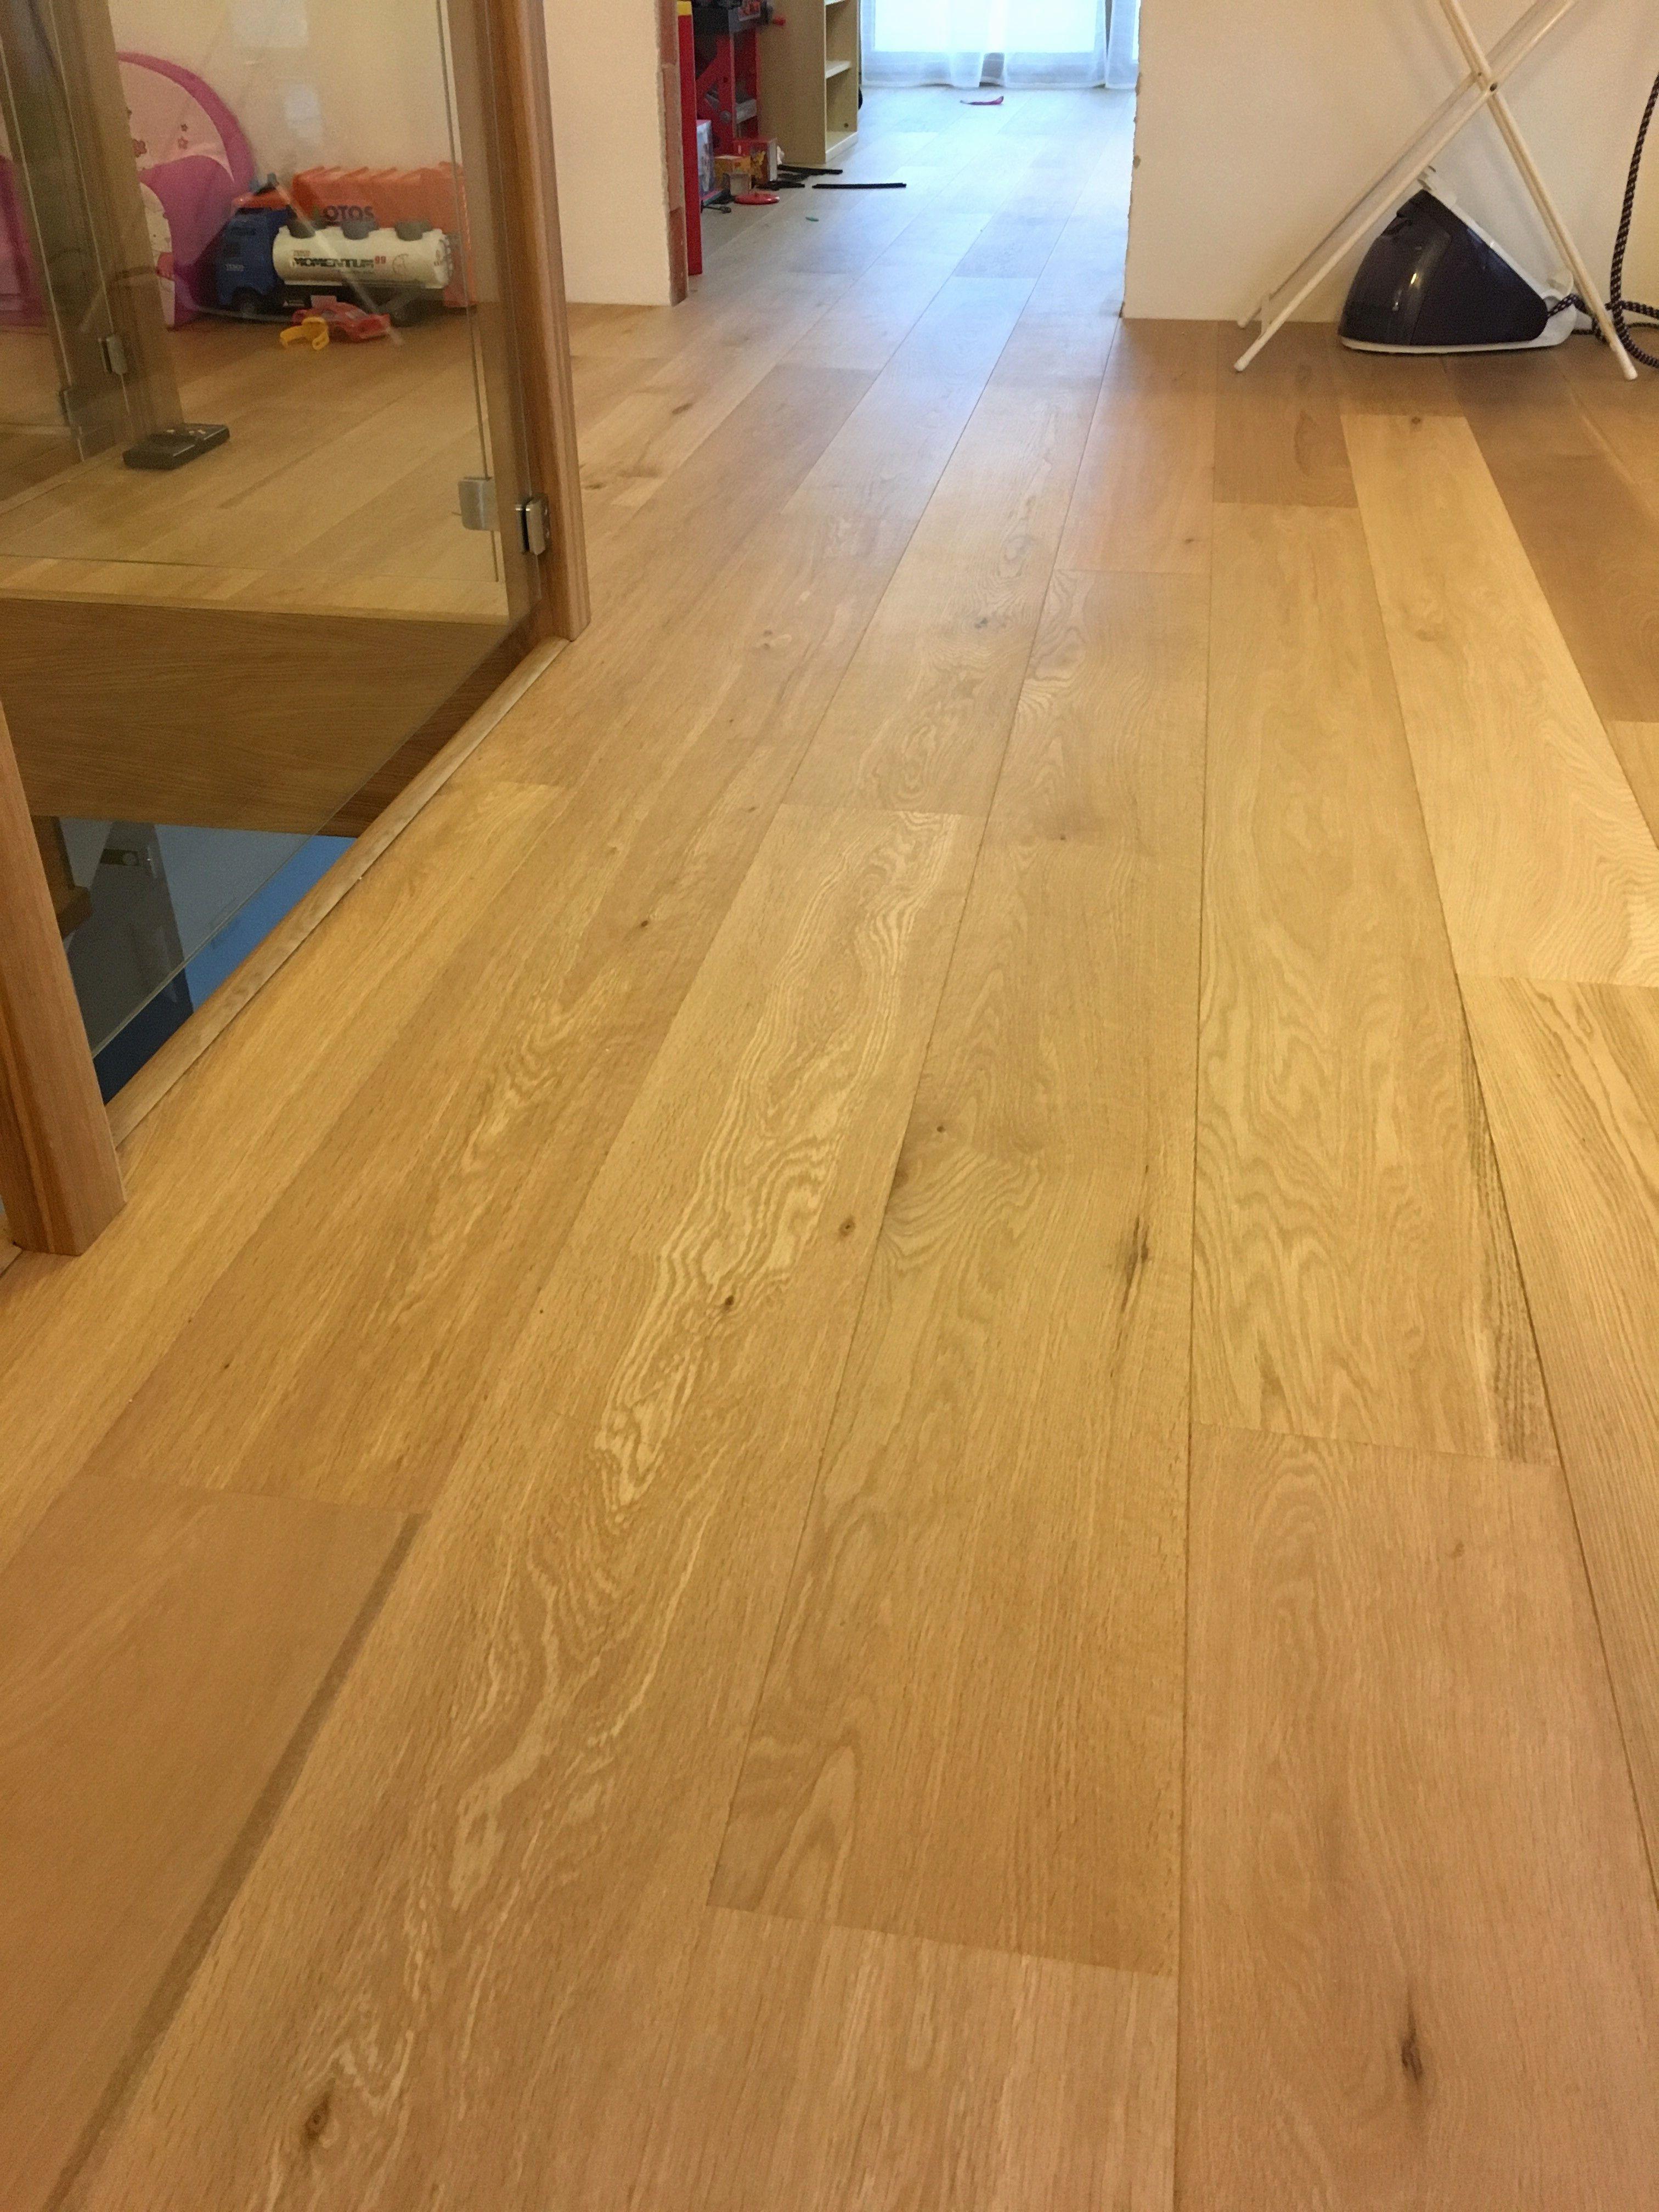 antique oak hardwood flooring of white oak flooring 40 used wood flooring for sale ideas floor plan with regard to hardwood flooring vs laminate beautiful naturalny dub od belgickaho va½robcu lamett hardwood flooring vs laminate